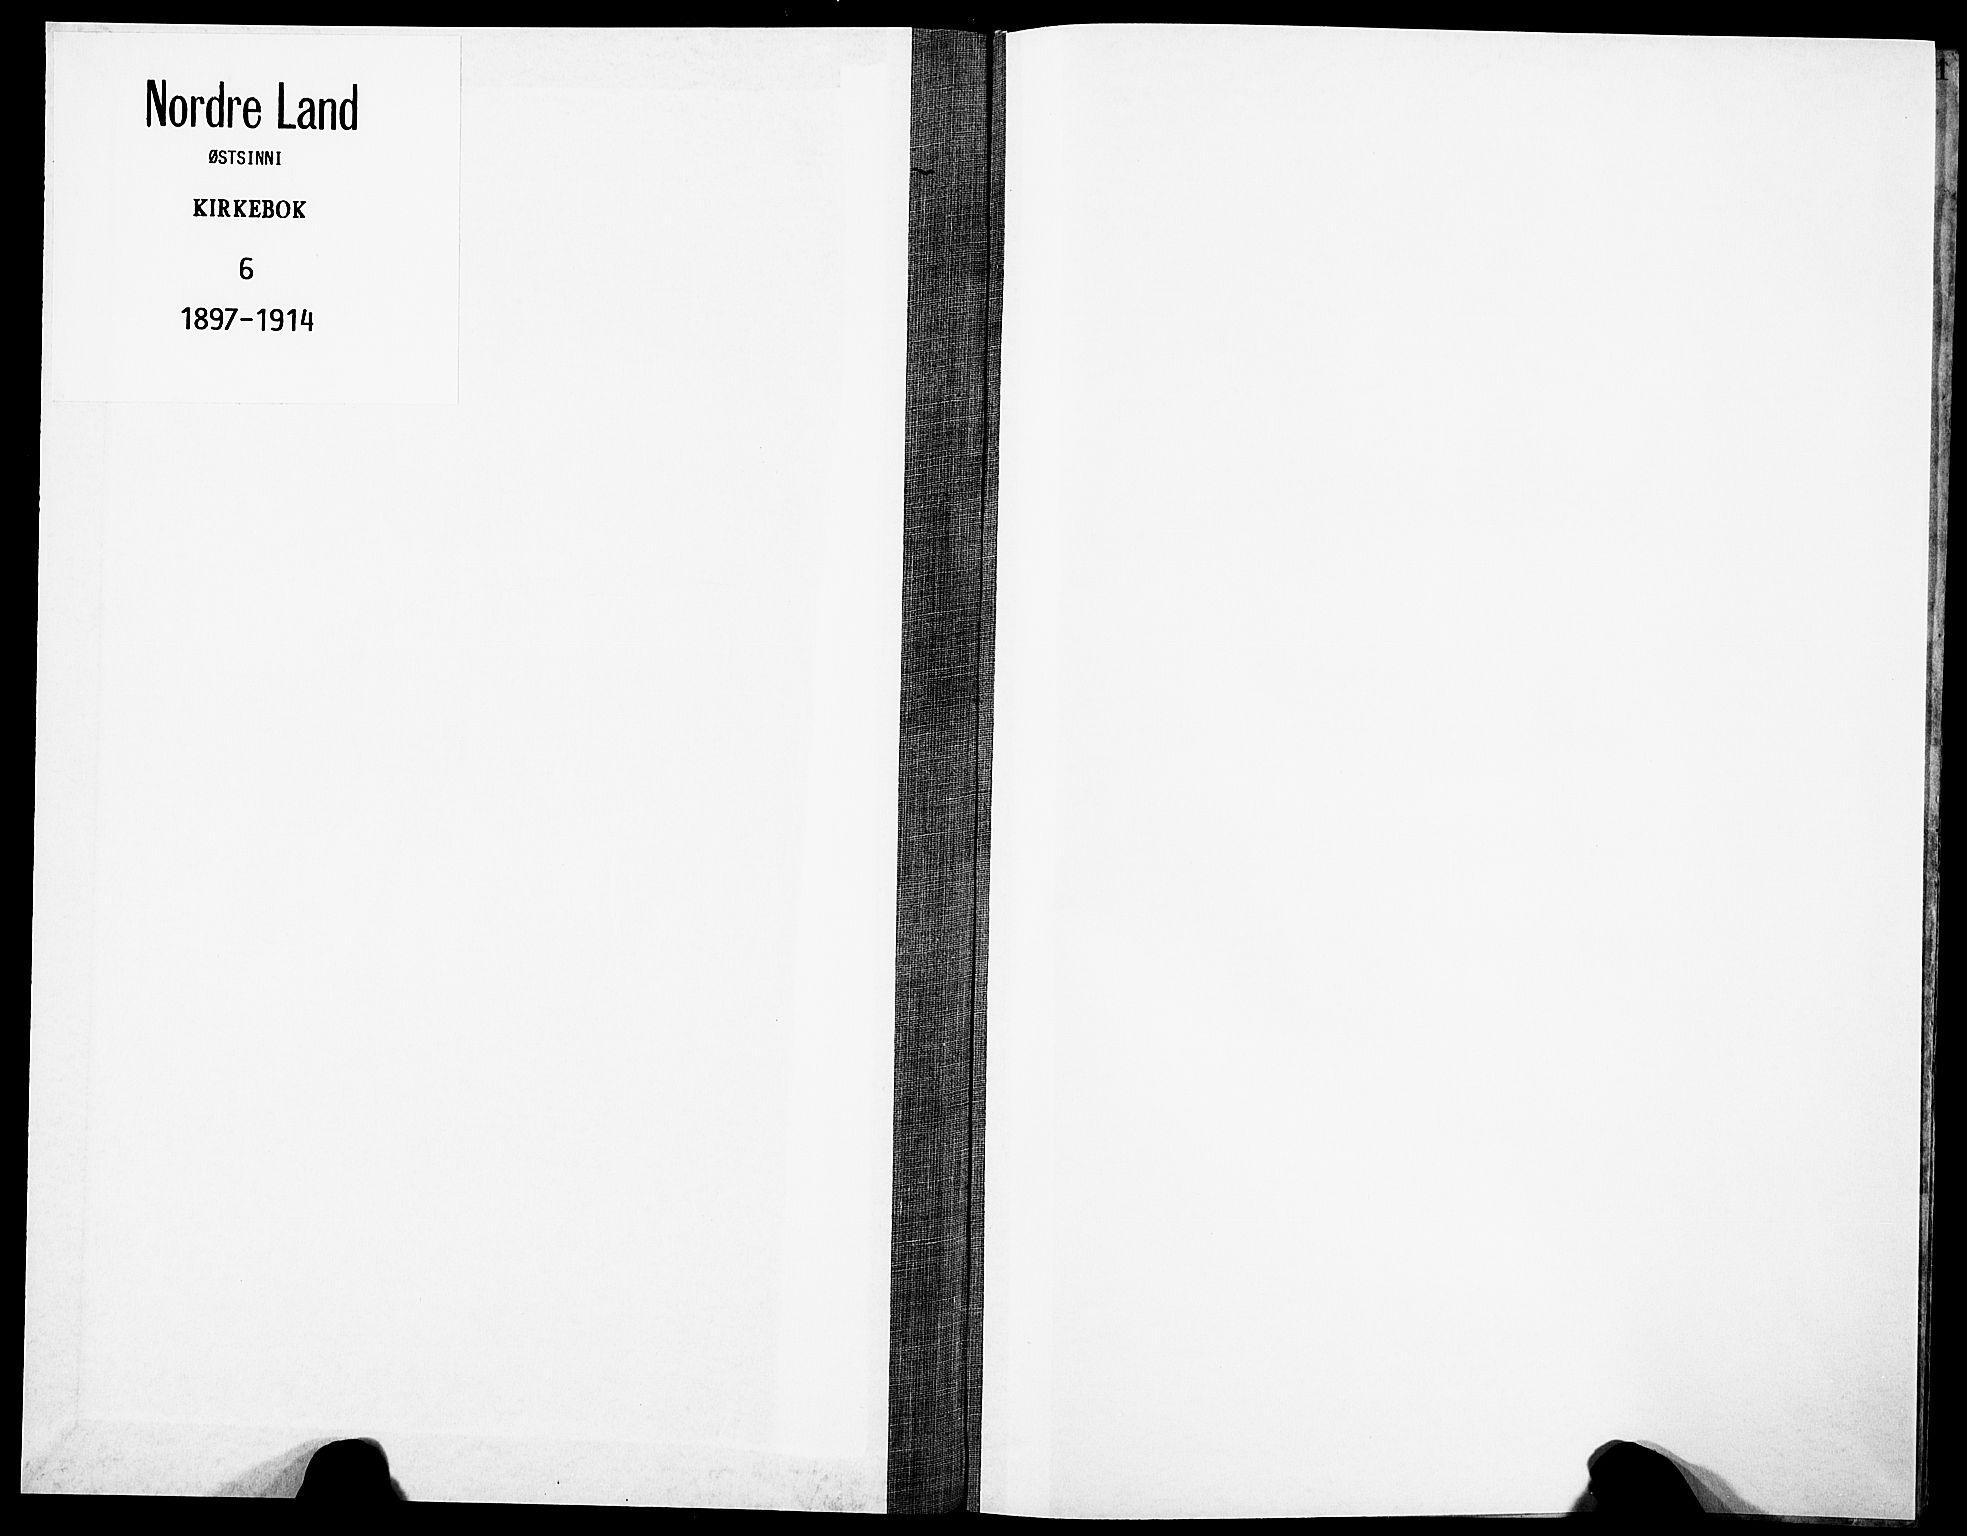 SAH, Nordre Land prestekontor, Ministerialbok nr. 6, 1897-1914